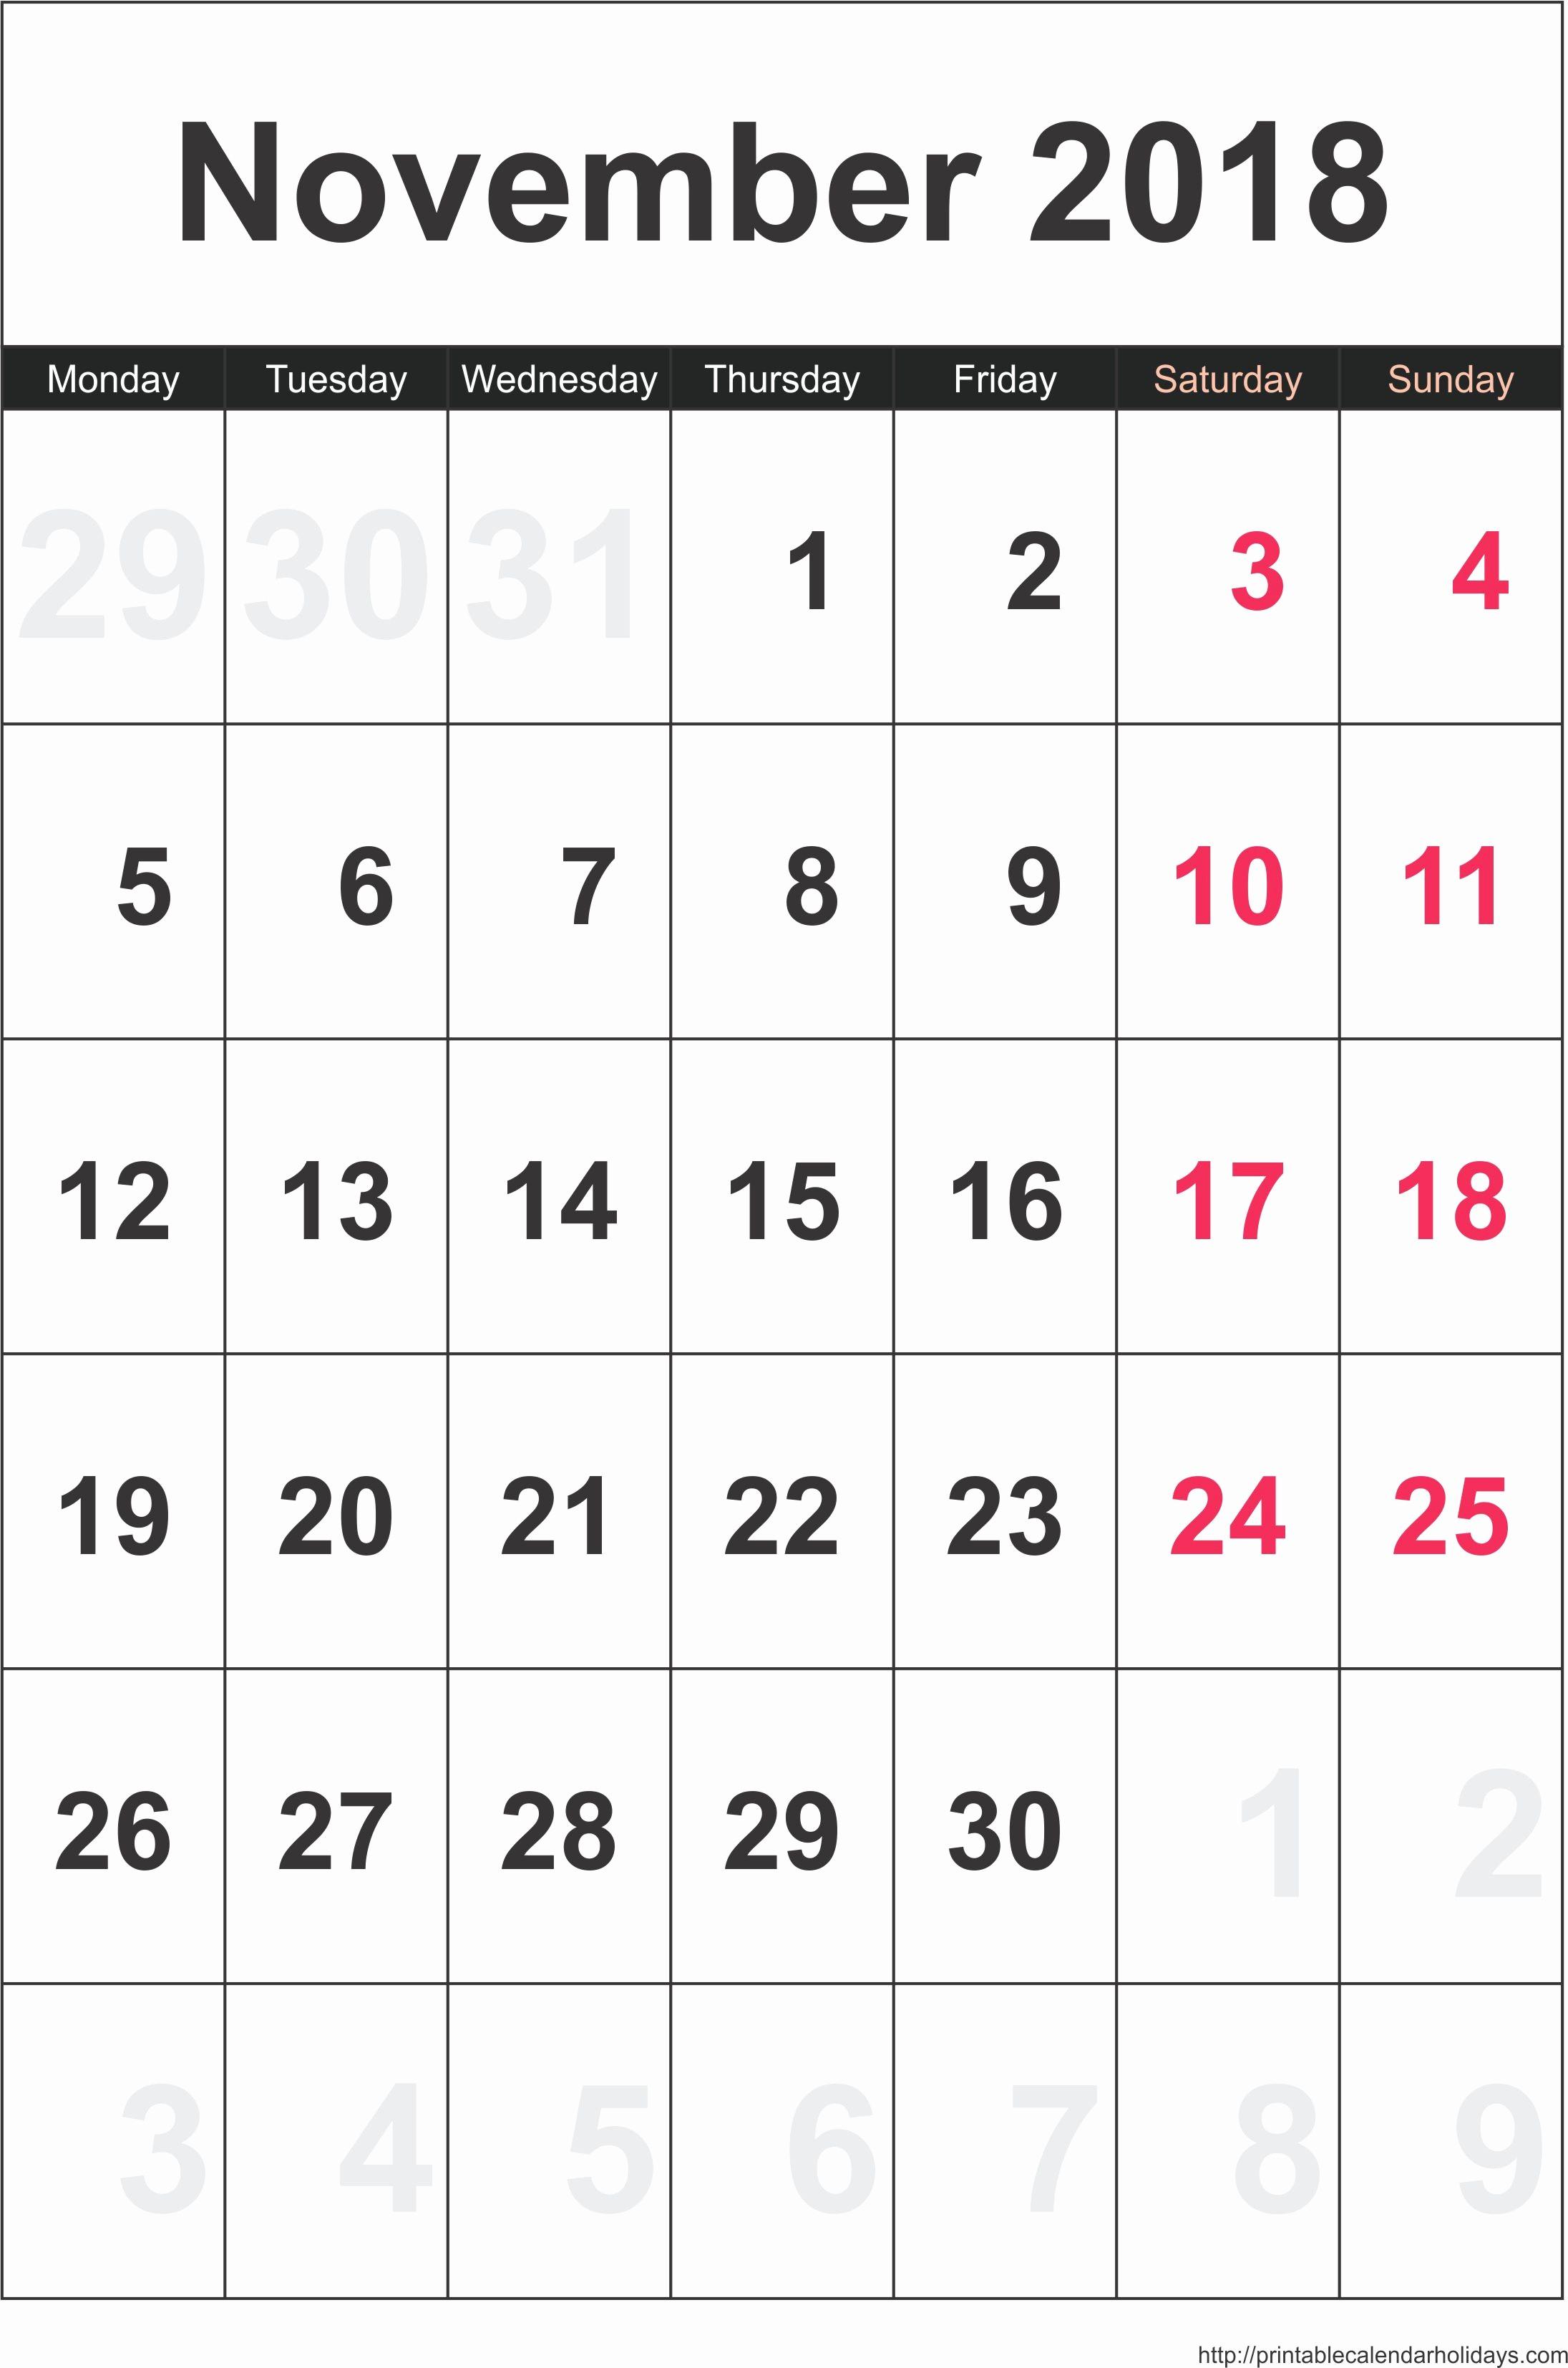 Calendar 2018 Printable with Holidays Elegant November 2018 Calendar Printable with Holidays